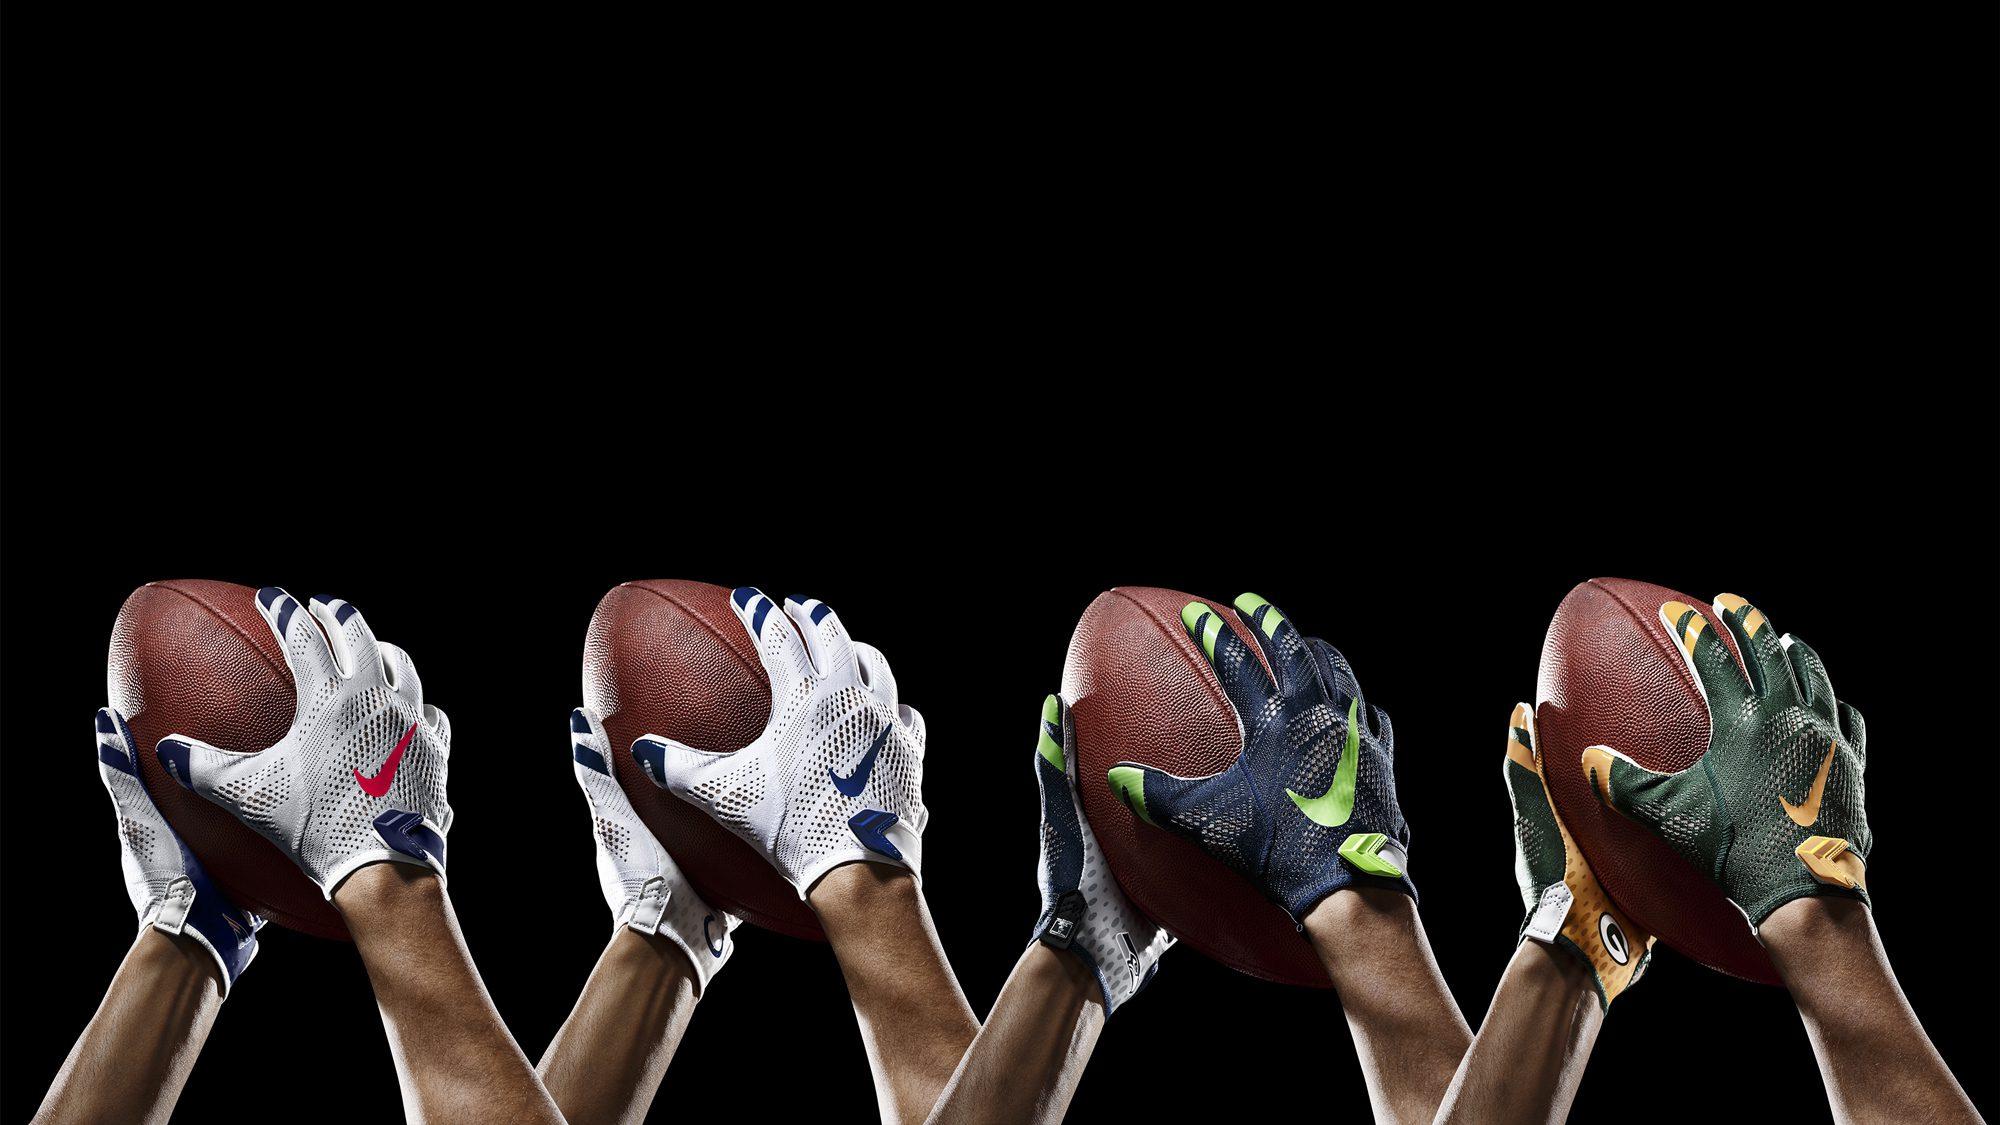 SP14_NFL_SB_TeamGloves_Ball_36856